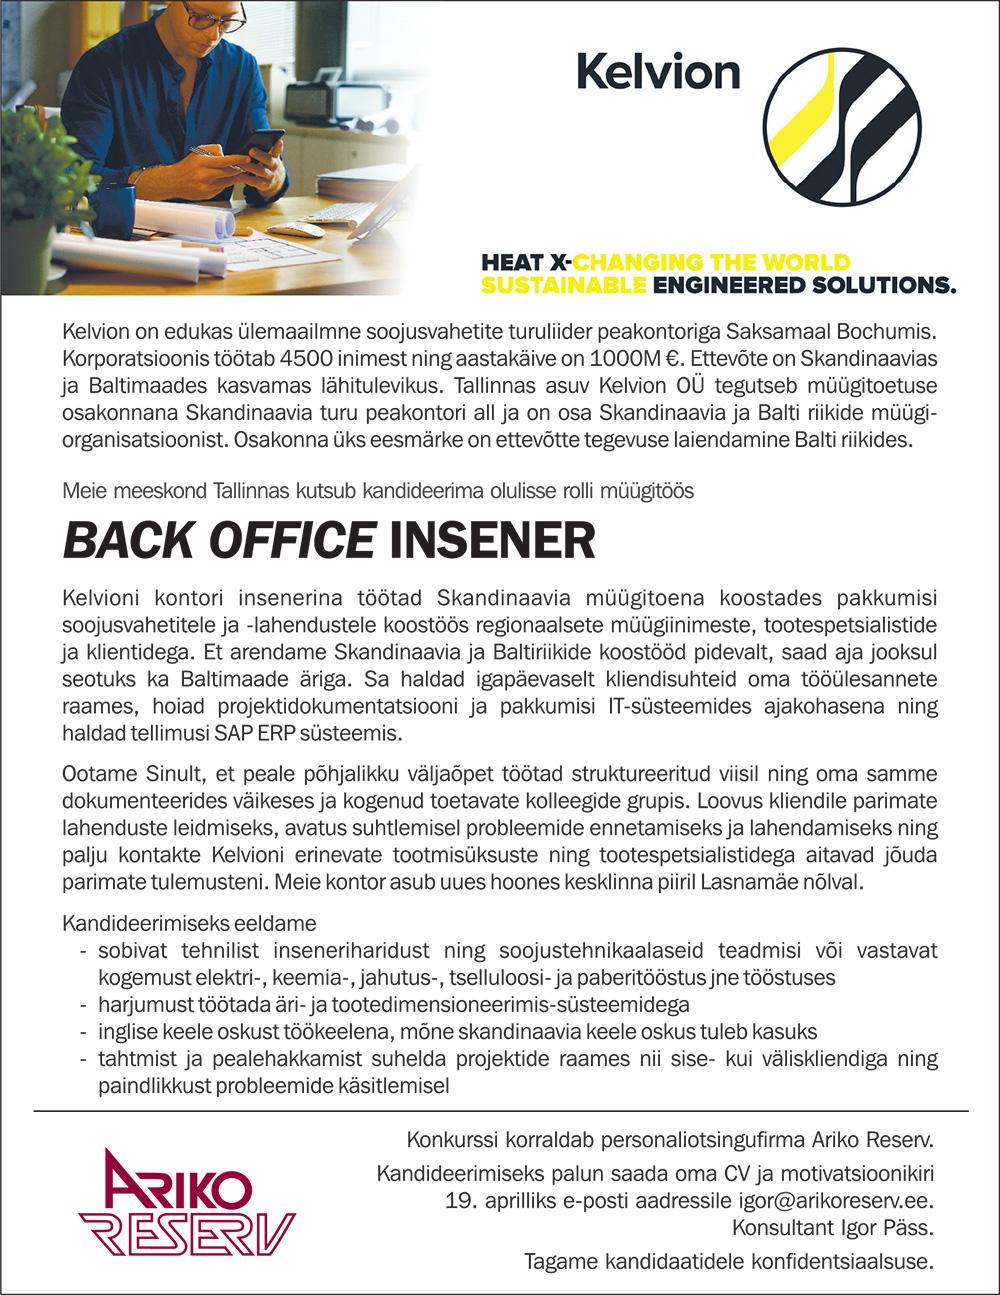 BACK OFFICE INSENER